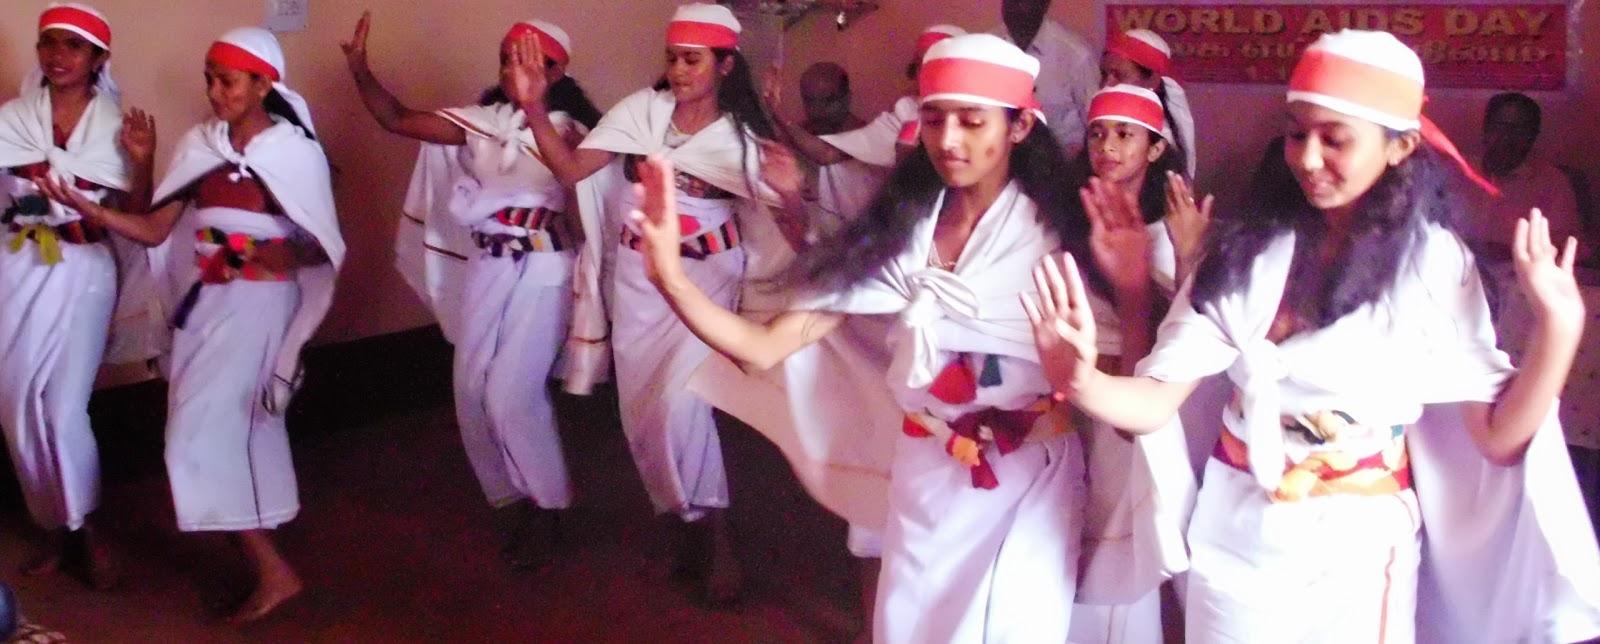 Badaga dance mp3 songs free download crisetx.